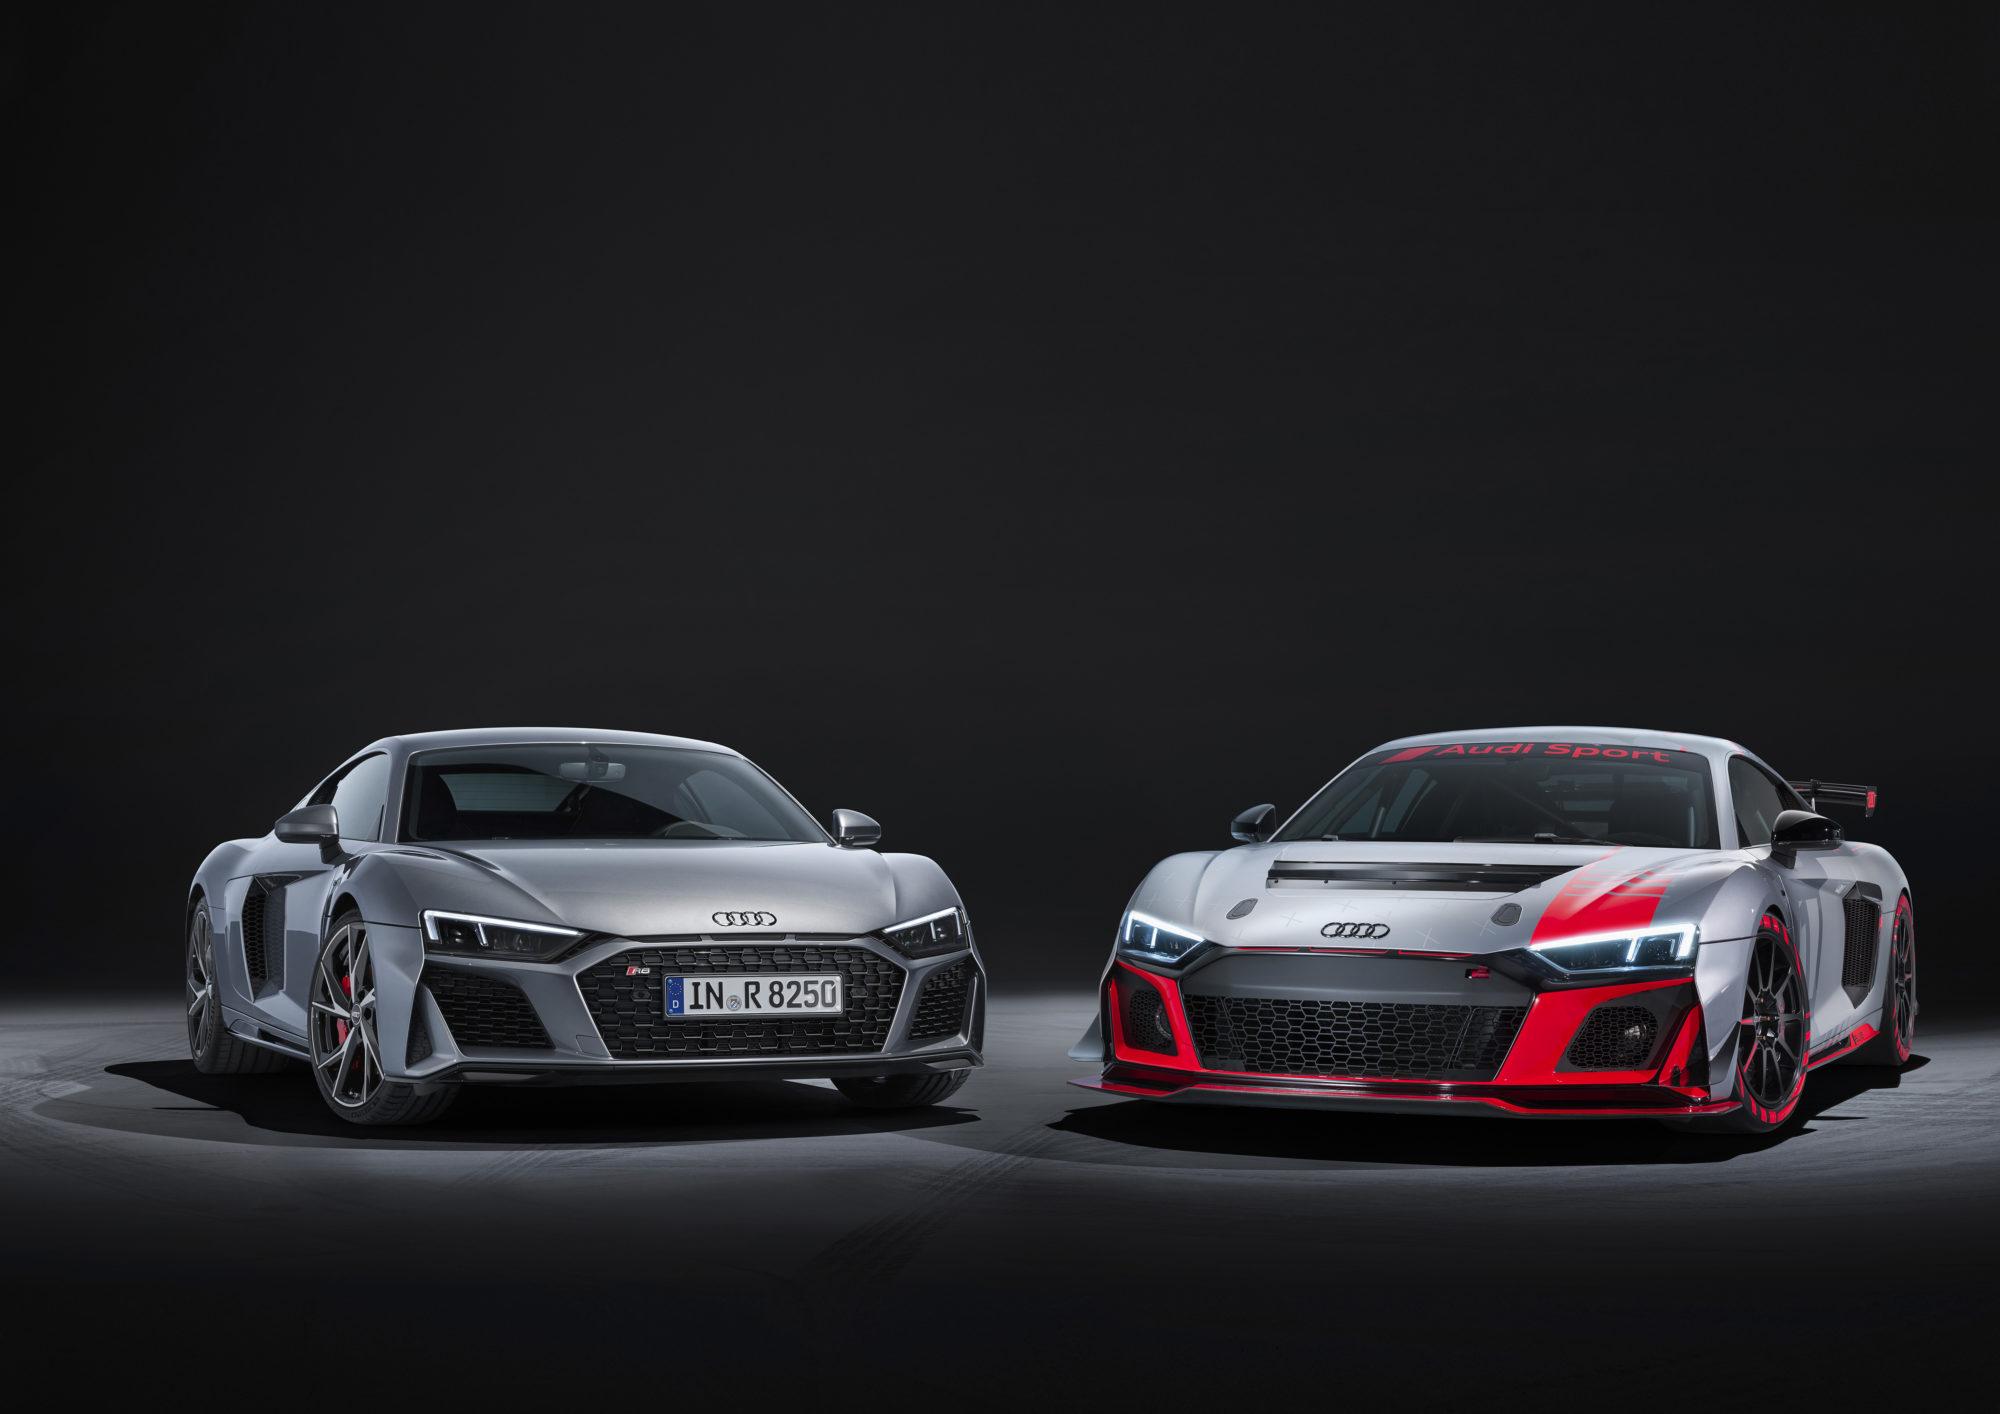 GT11-Sport: Audi R11 LMS erhält neues Design - SportsCar-Info.de | audi car sport